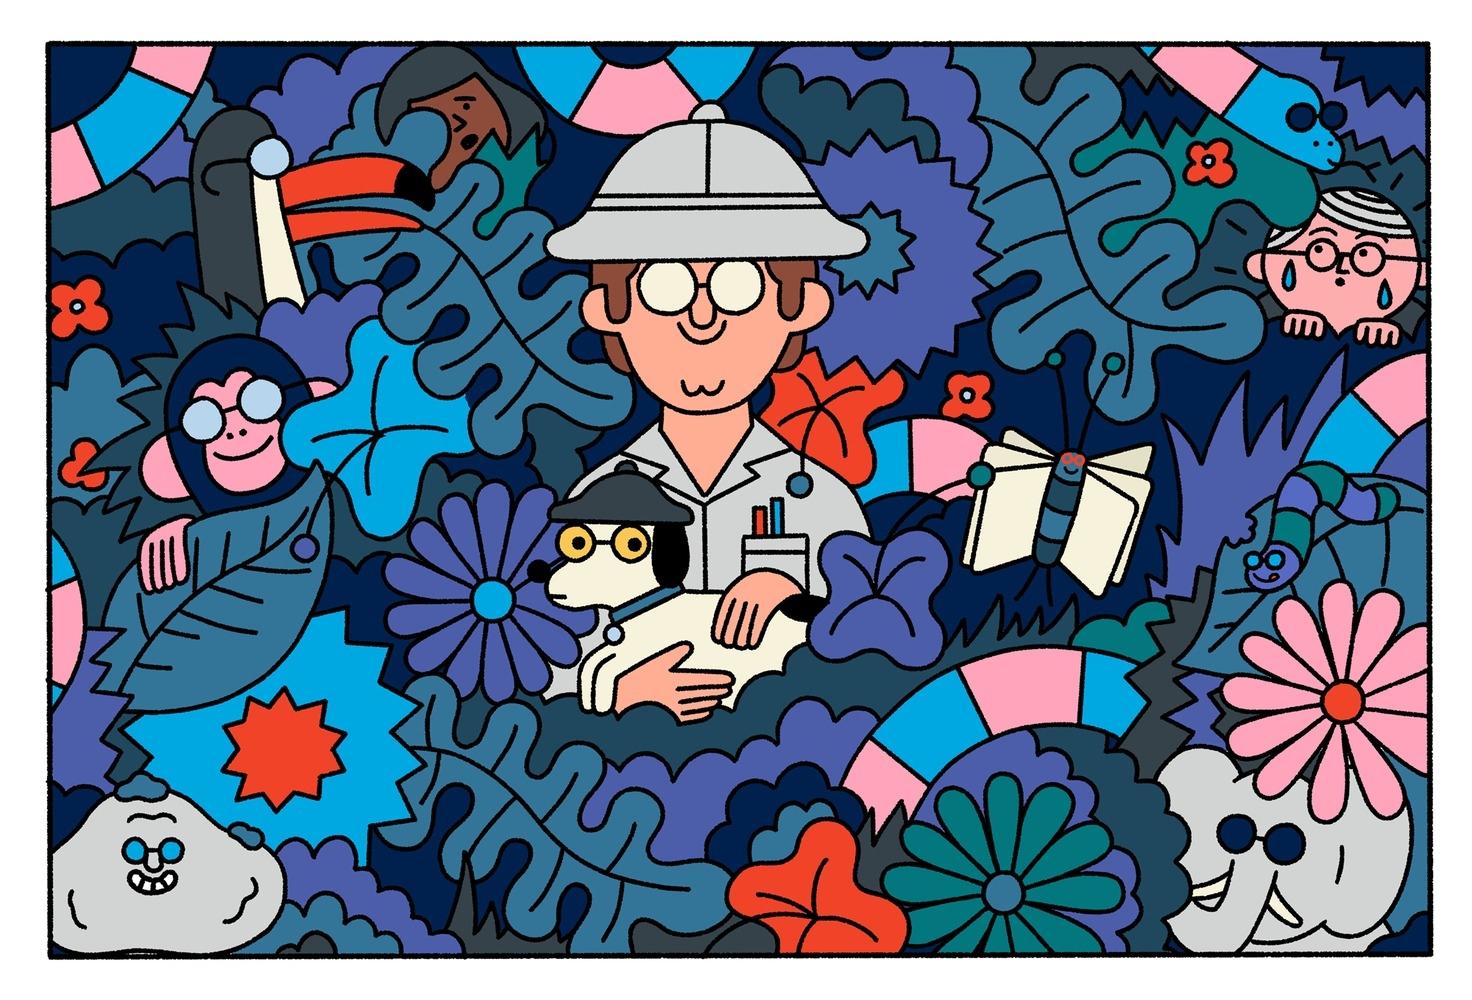 ATRBUTE Welcomes Leillo, the Illustration Studio of Leon Edler